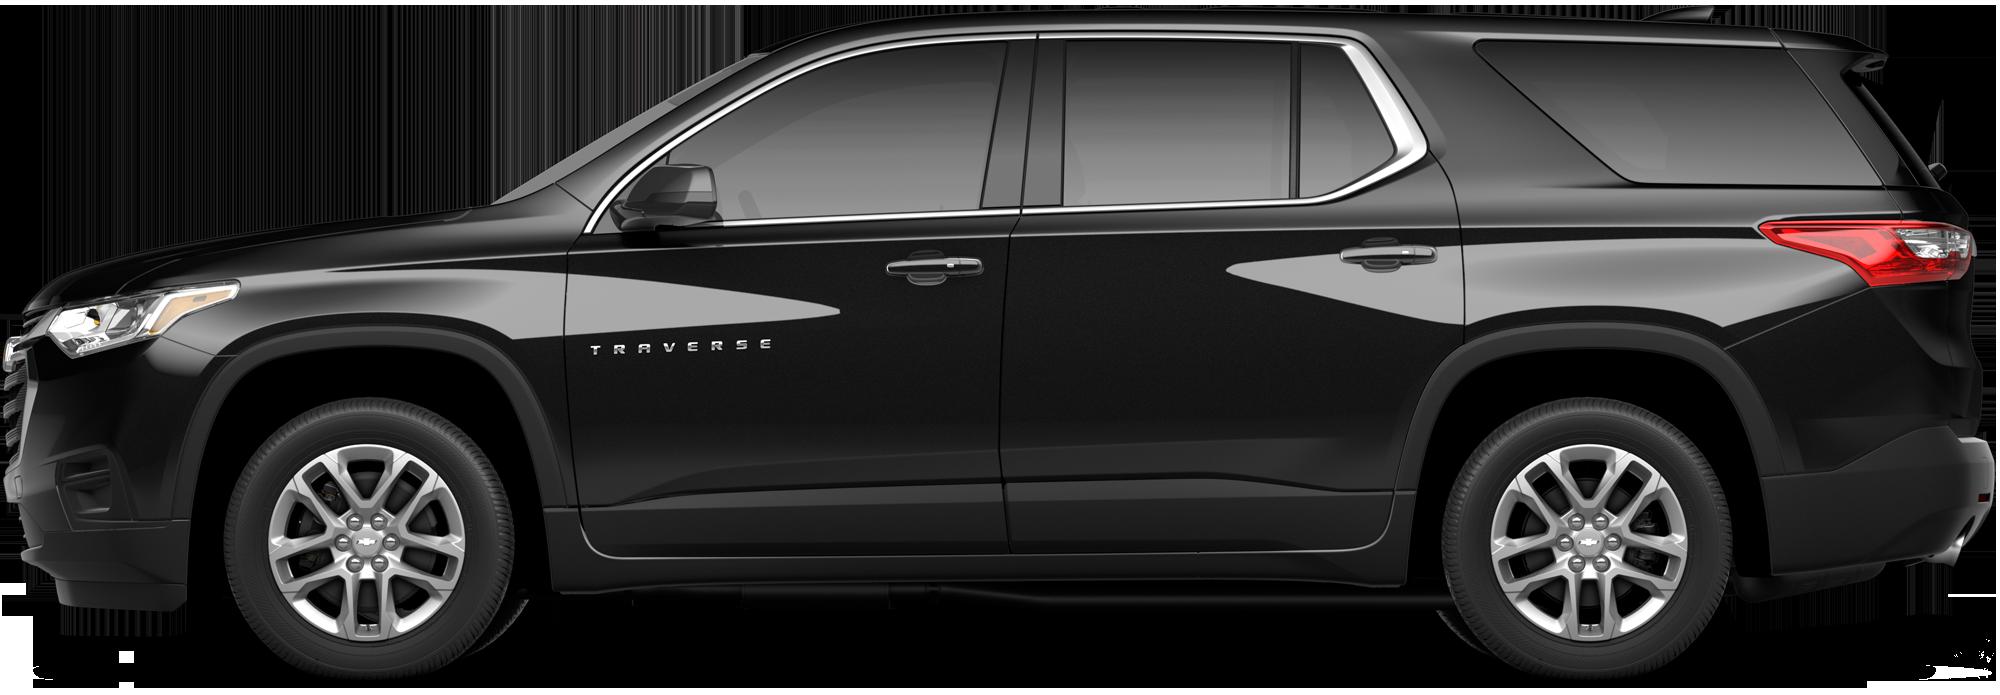 2021 Chevrolet Traverse SUV LS w/1LS